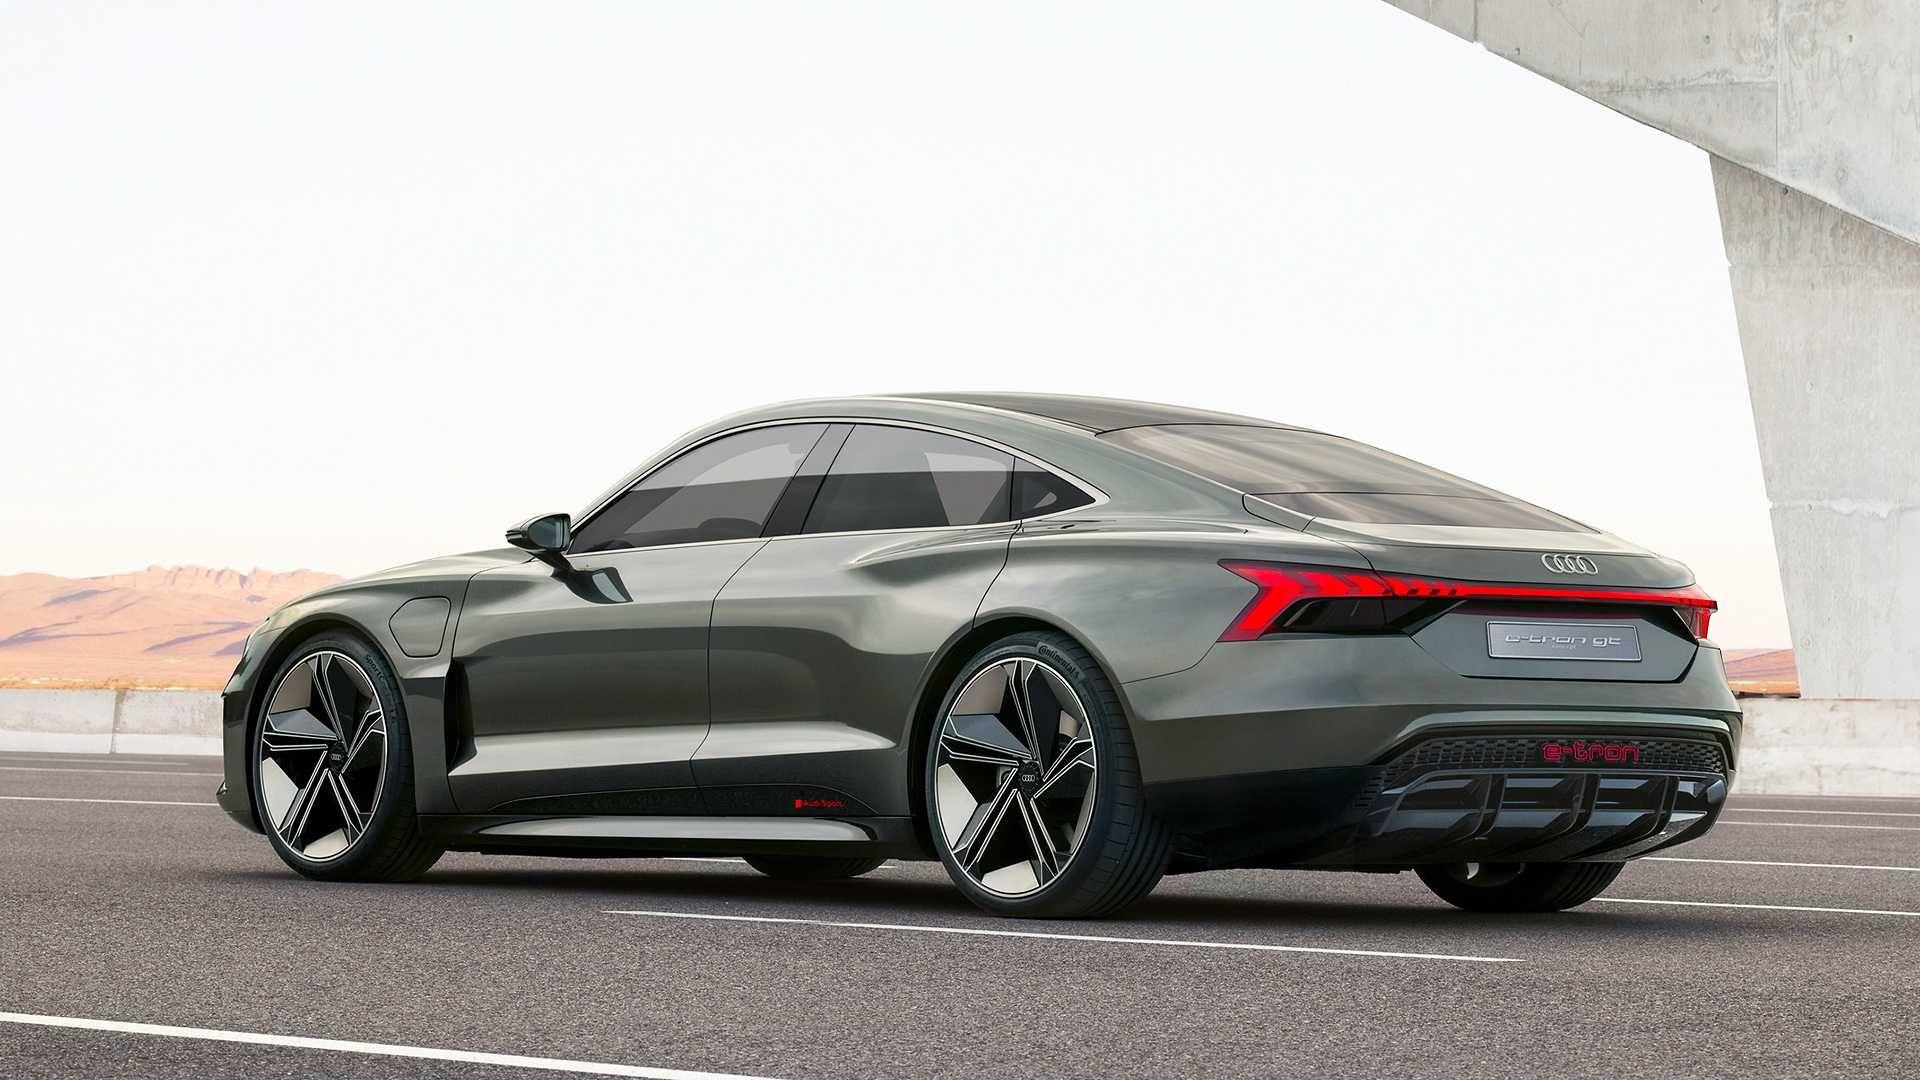 The Audi E Tron Gt Concept Previews Audi S Answer To The Tesla